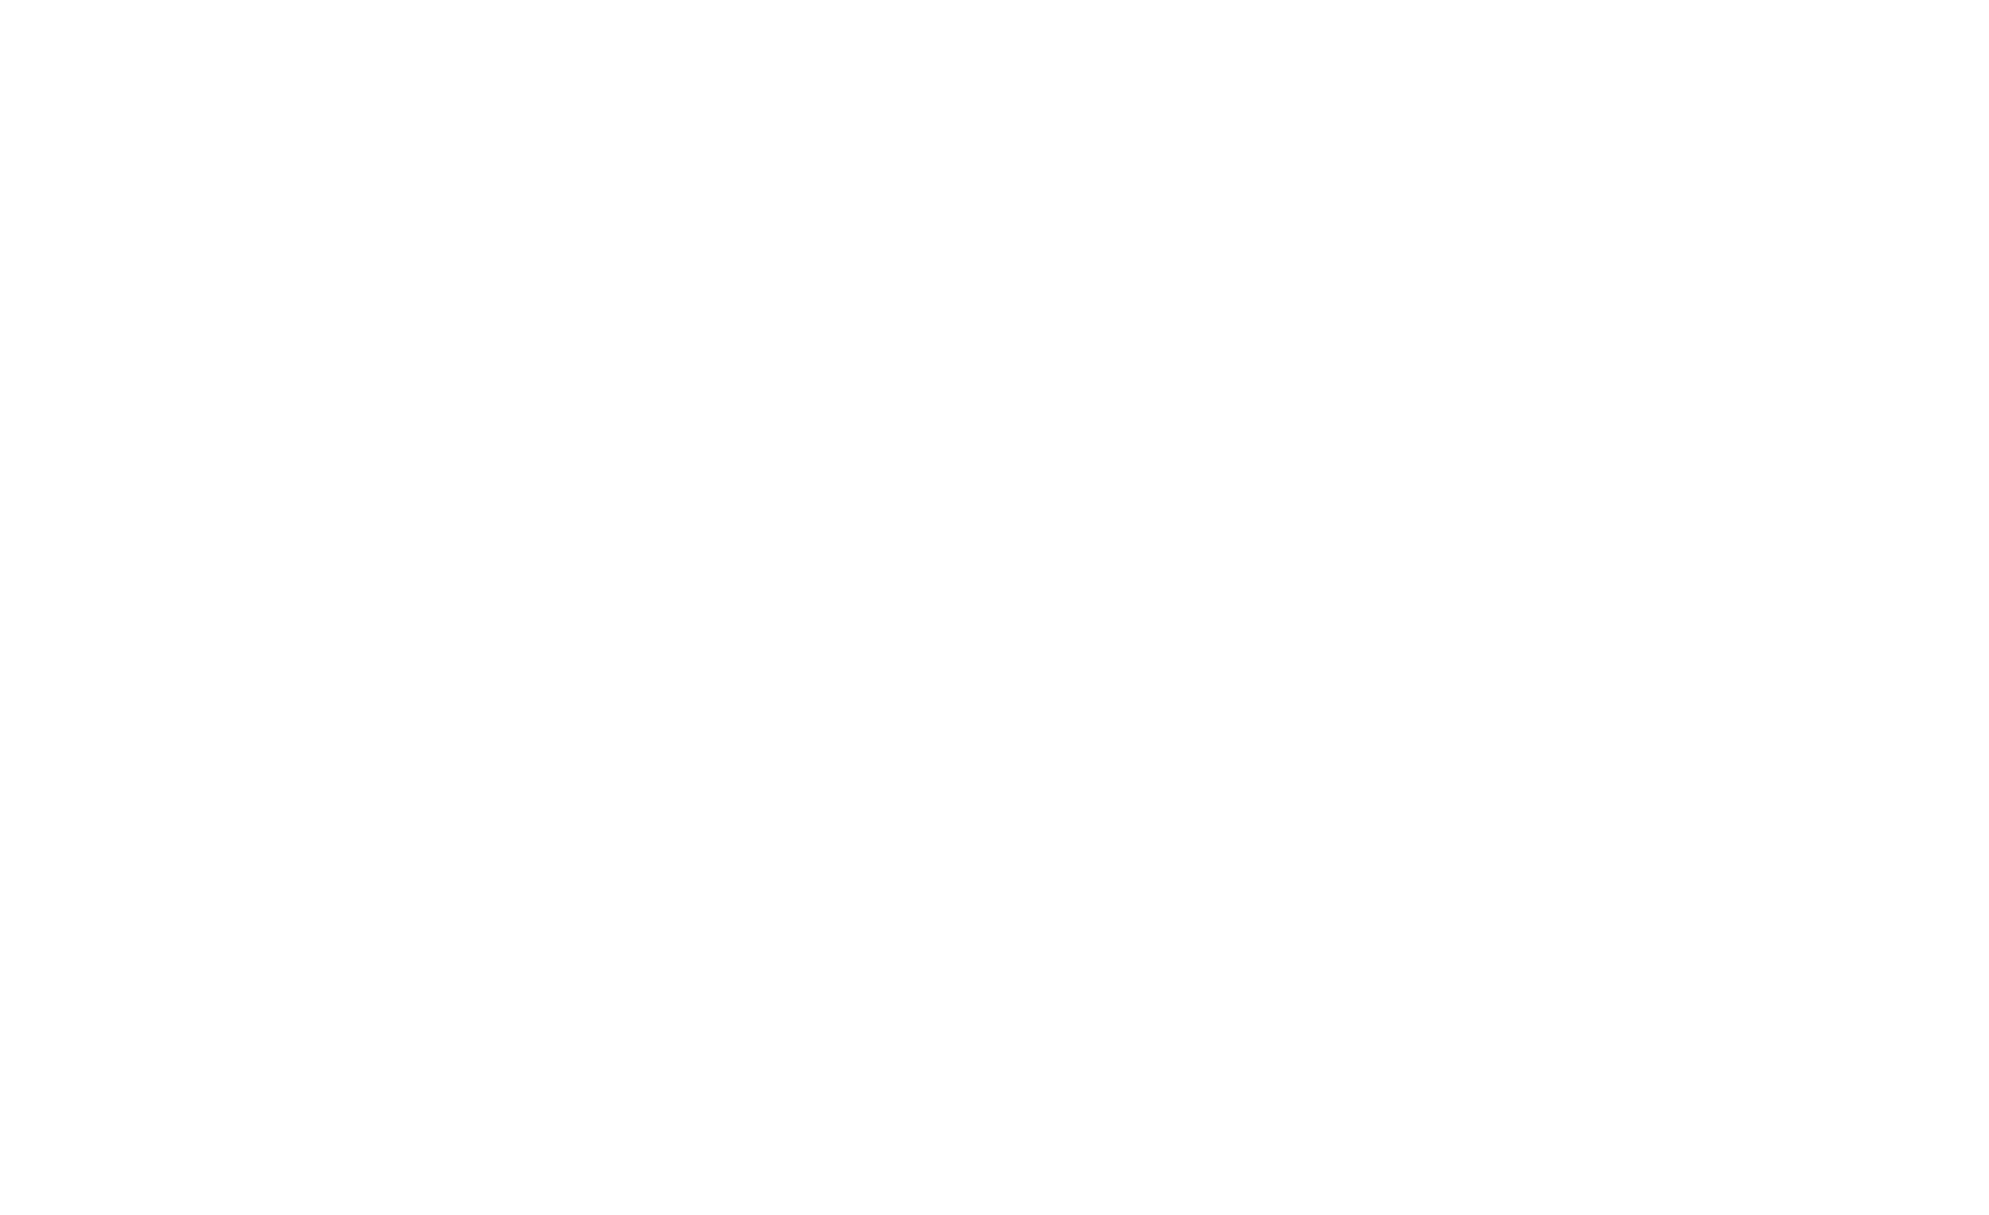 127_logo-number-white.png